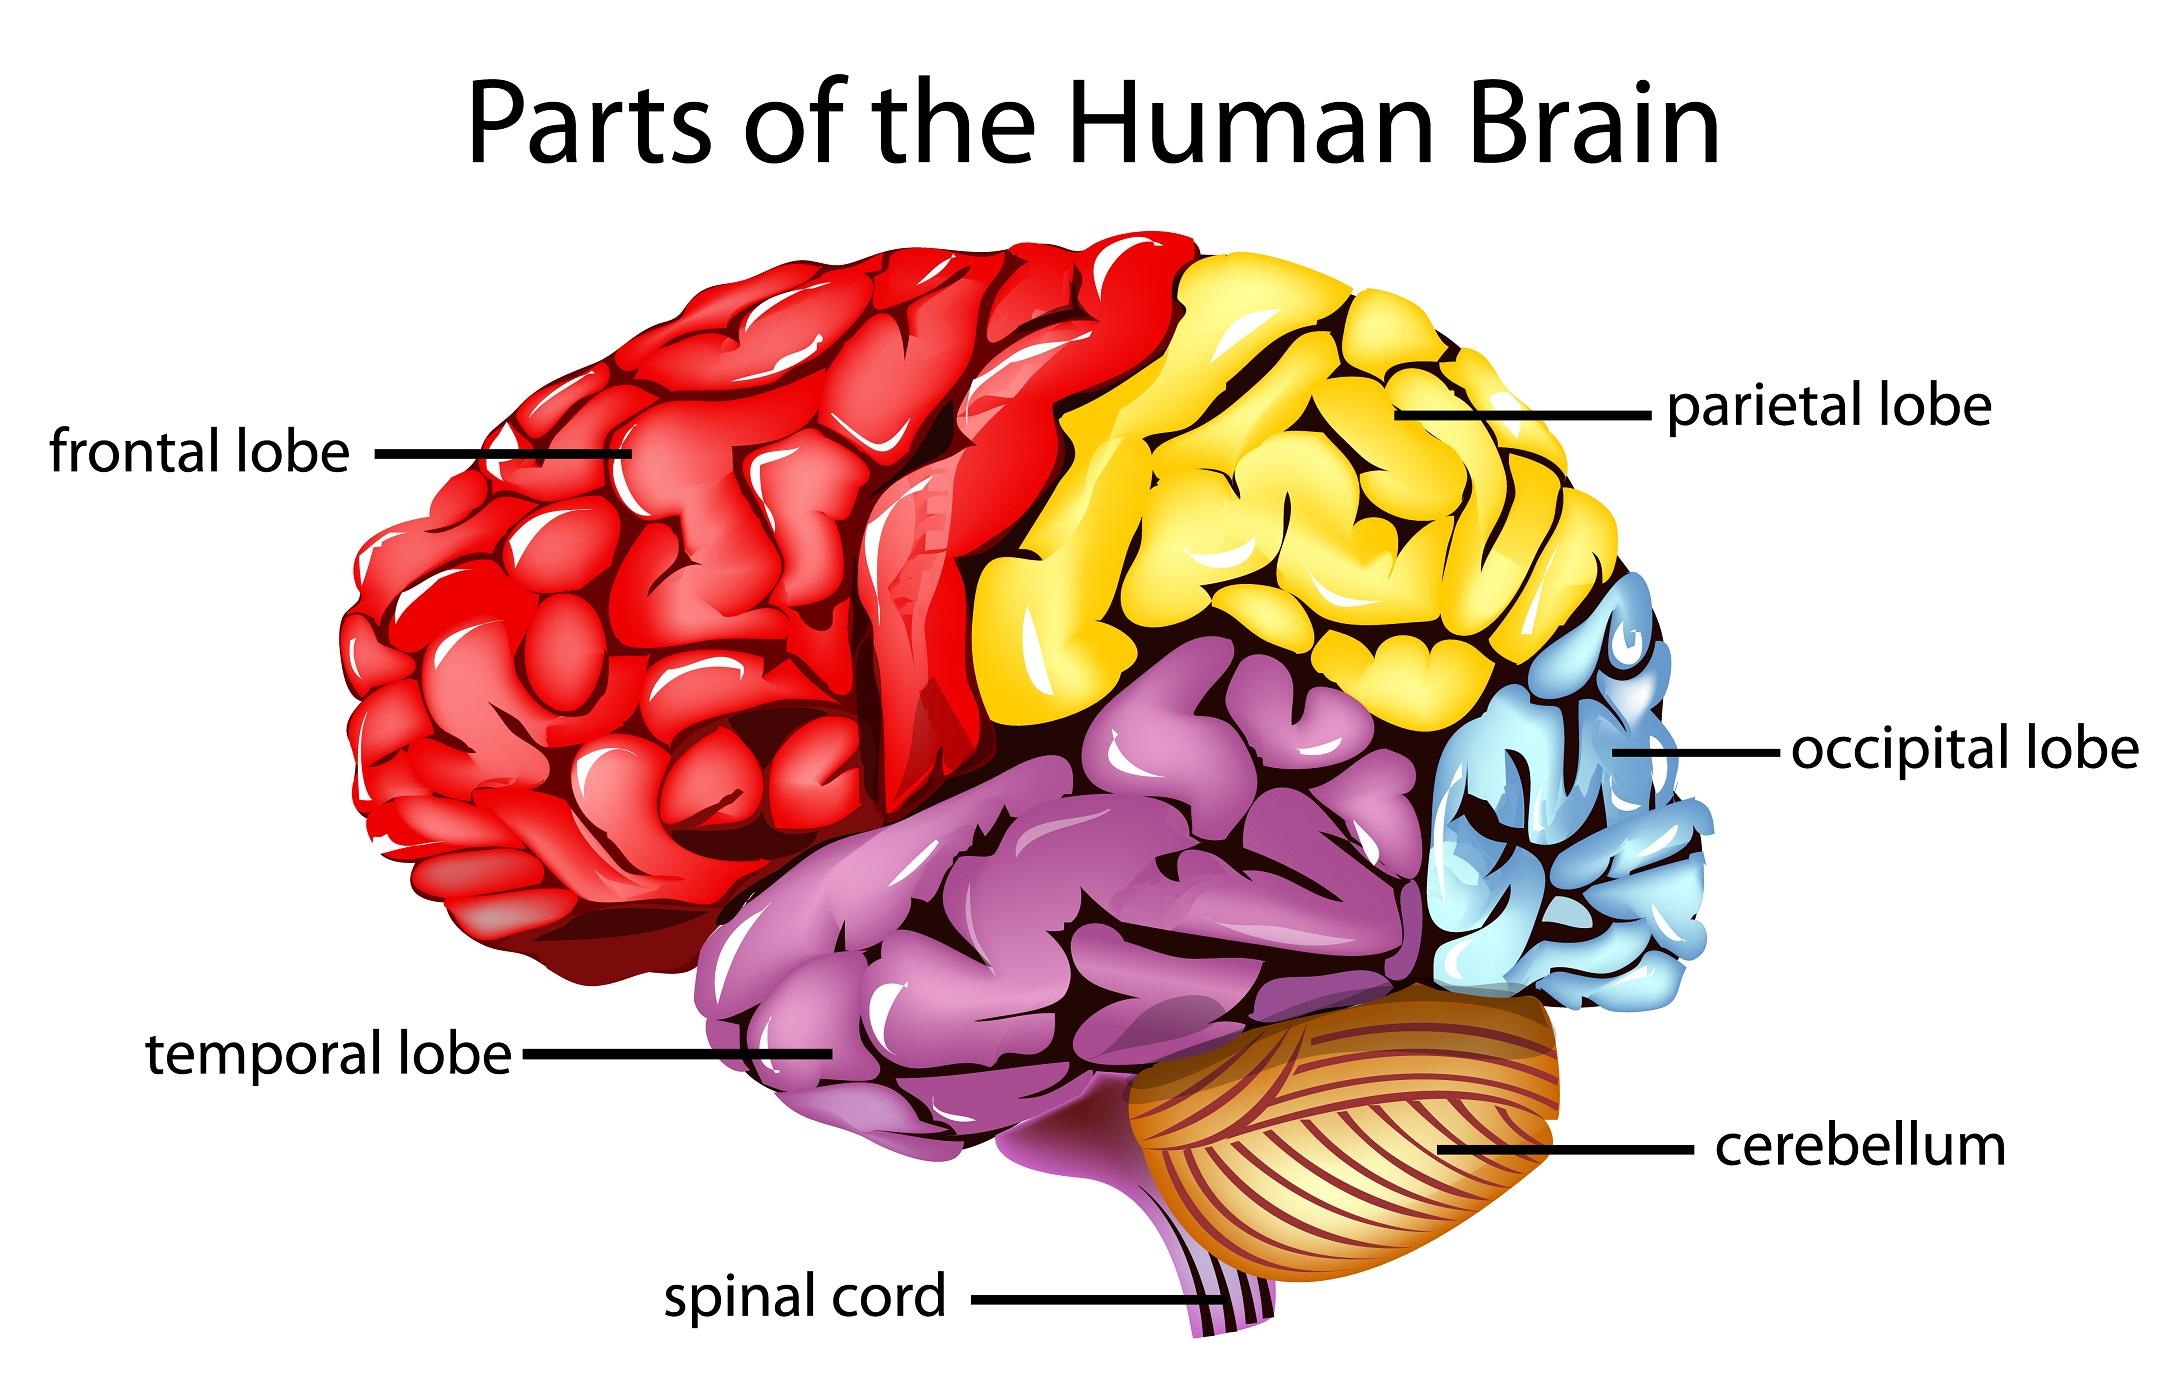 Brain clipart label. Of human simple diagram